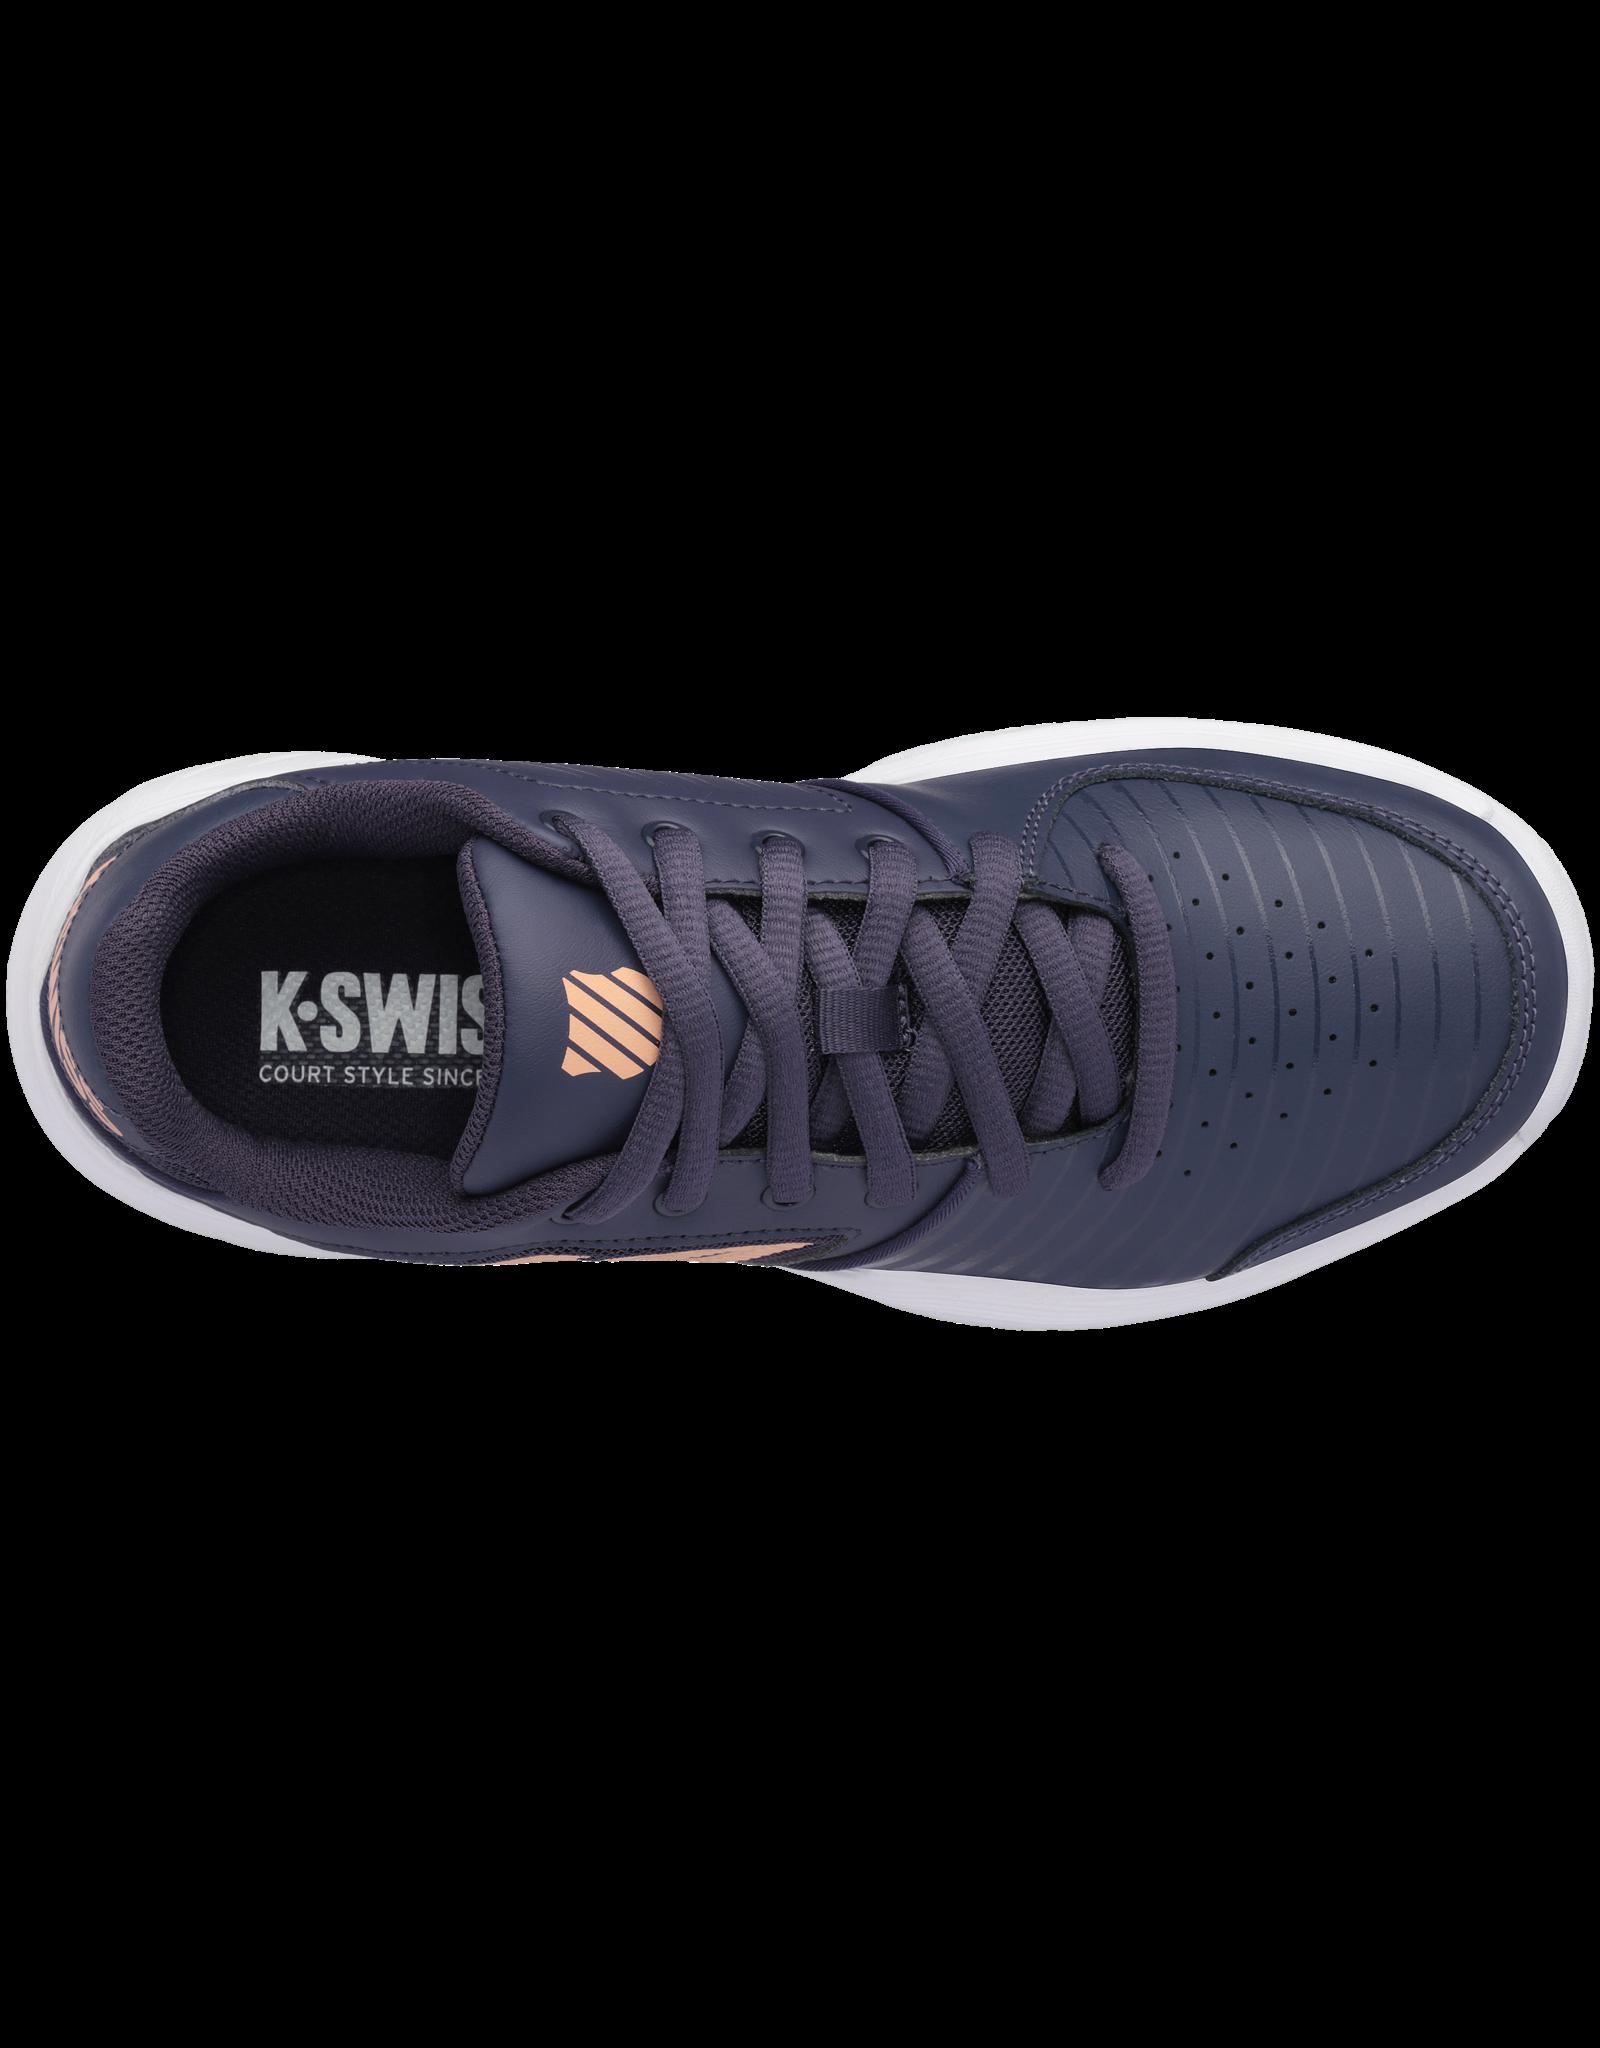 K-swiss LADIES-KS TFW COURT EXPRESS HB-GRAYSTONE/PEACH NECTAR/WHT